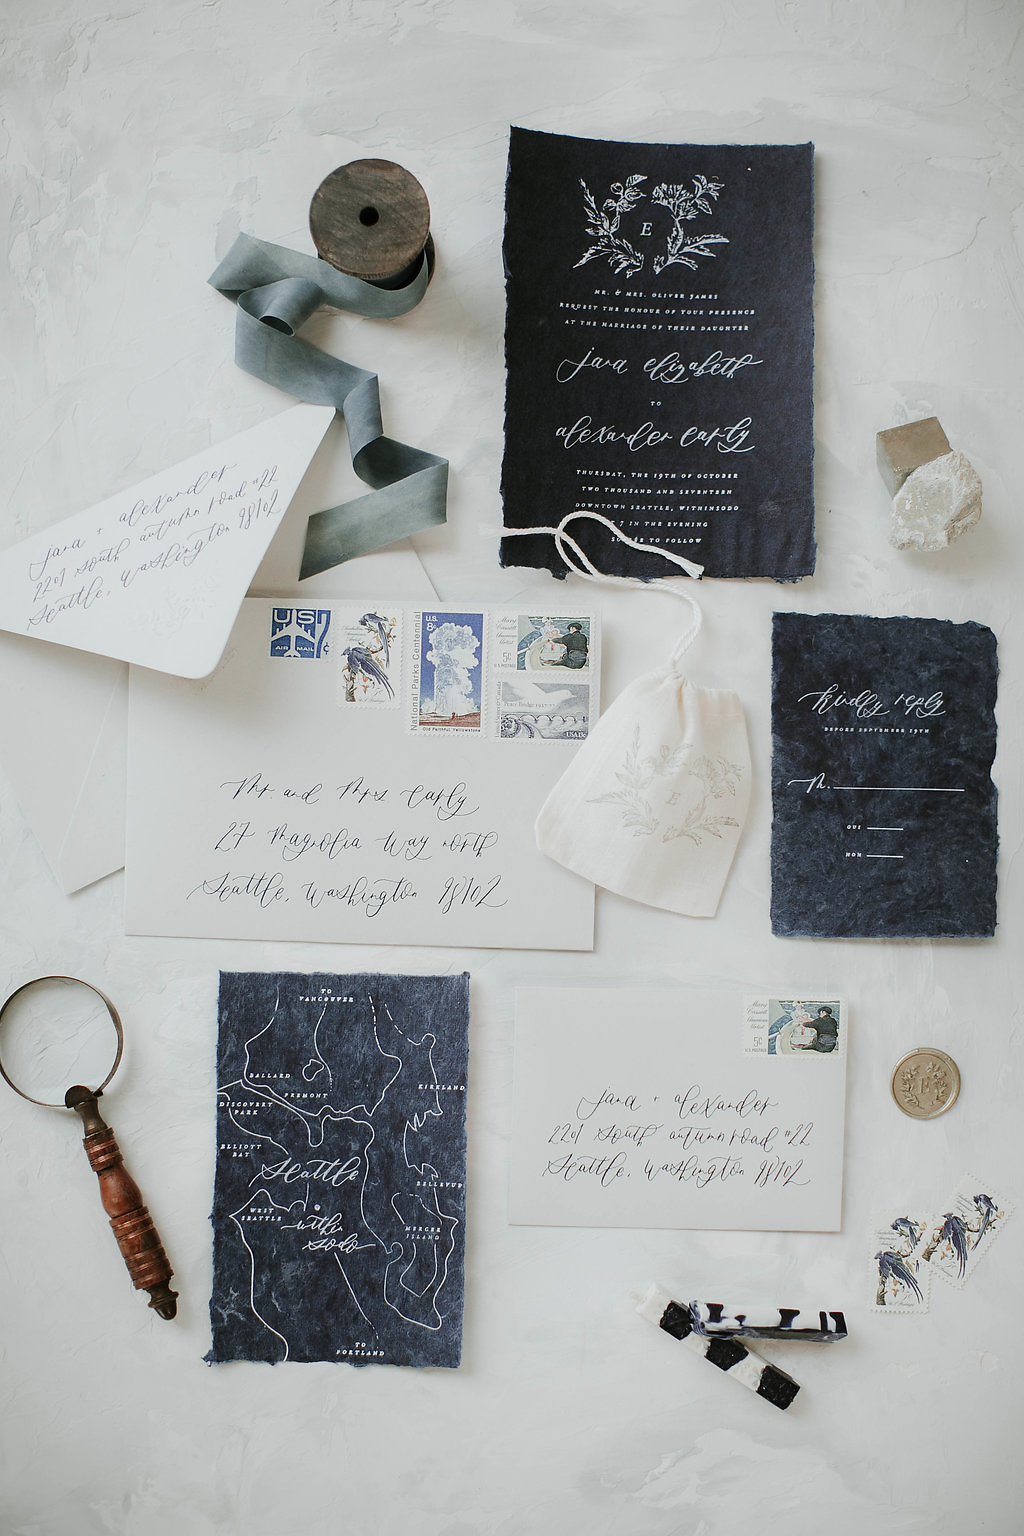 The_Big_Fake_wedding_Seattle_Within_sodo_wedding_by_Adina_Preston_Weddings_60.JPG